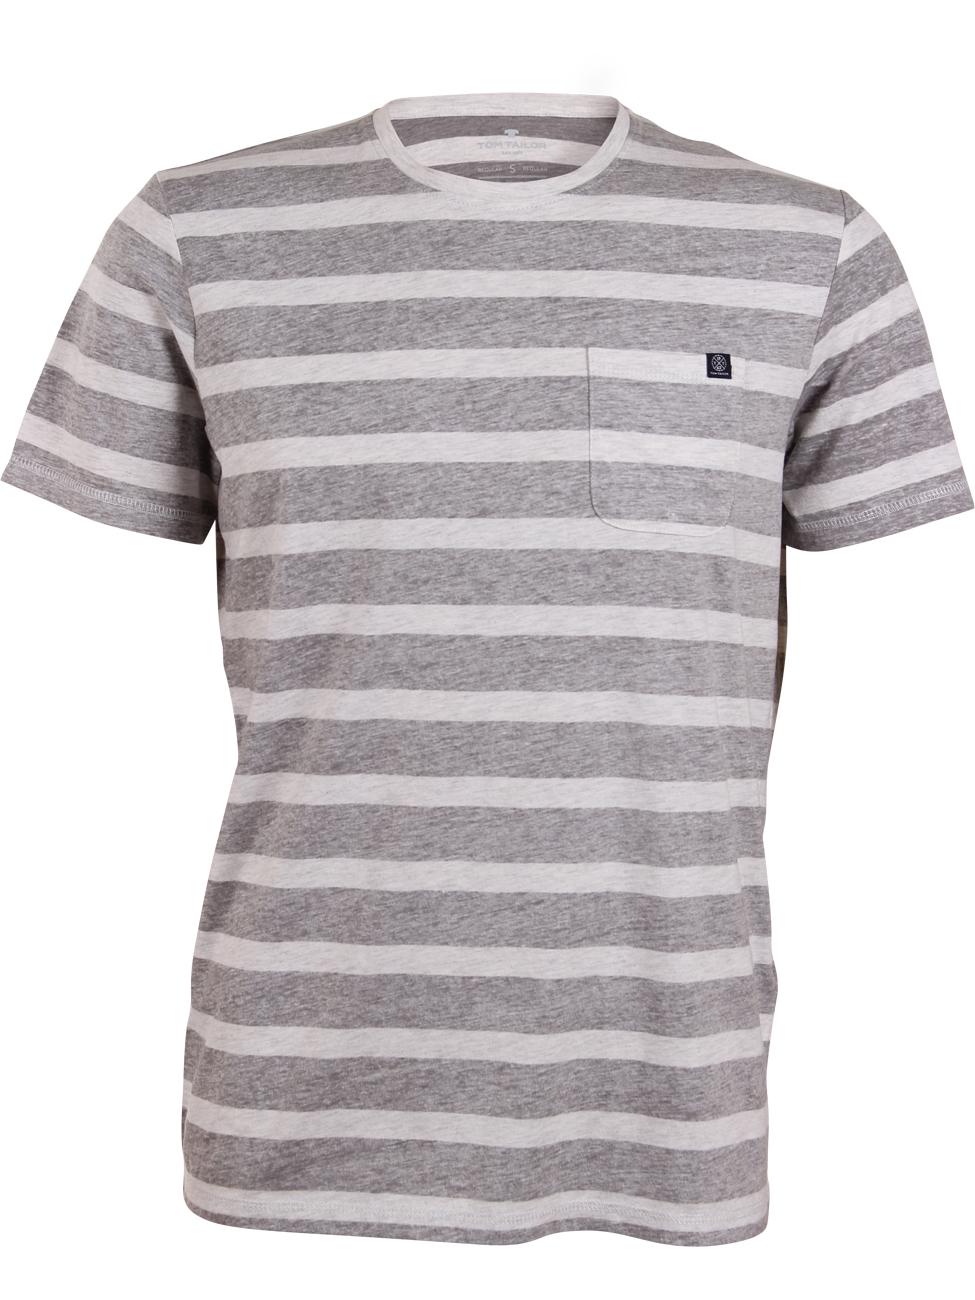 Tom Tailor Herren Rundhals T-Shirt Striped Tee